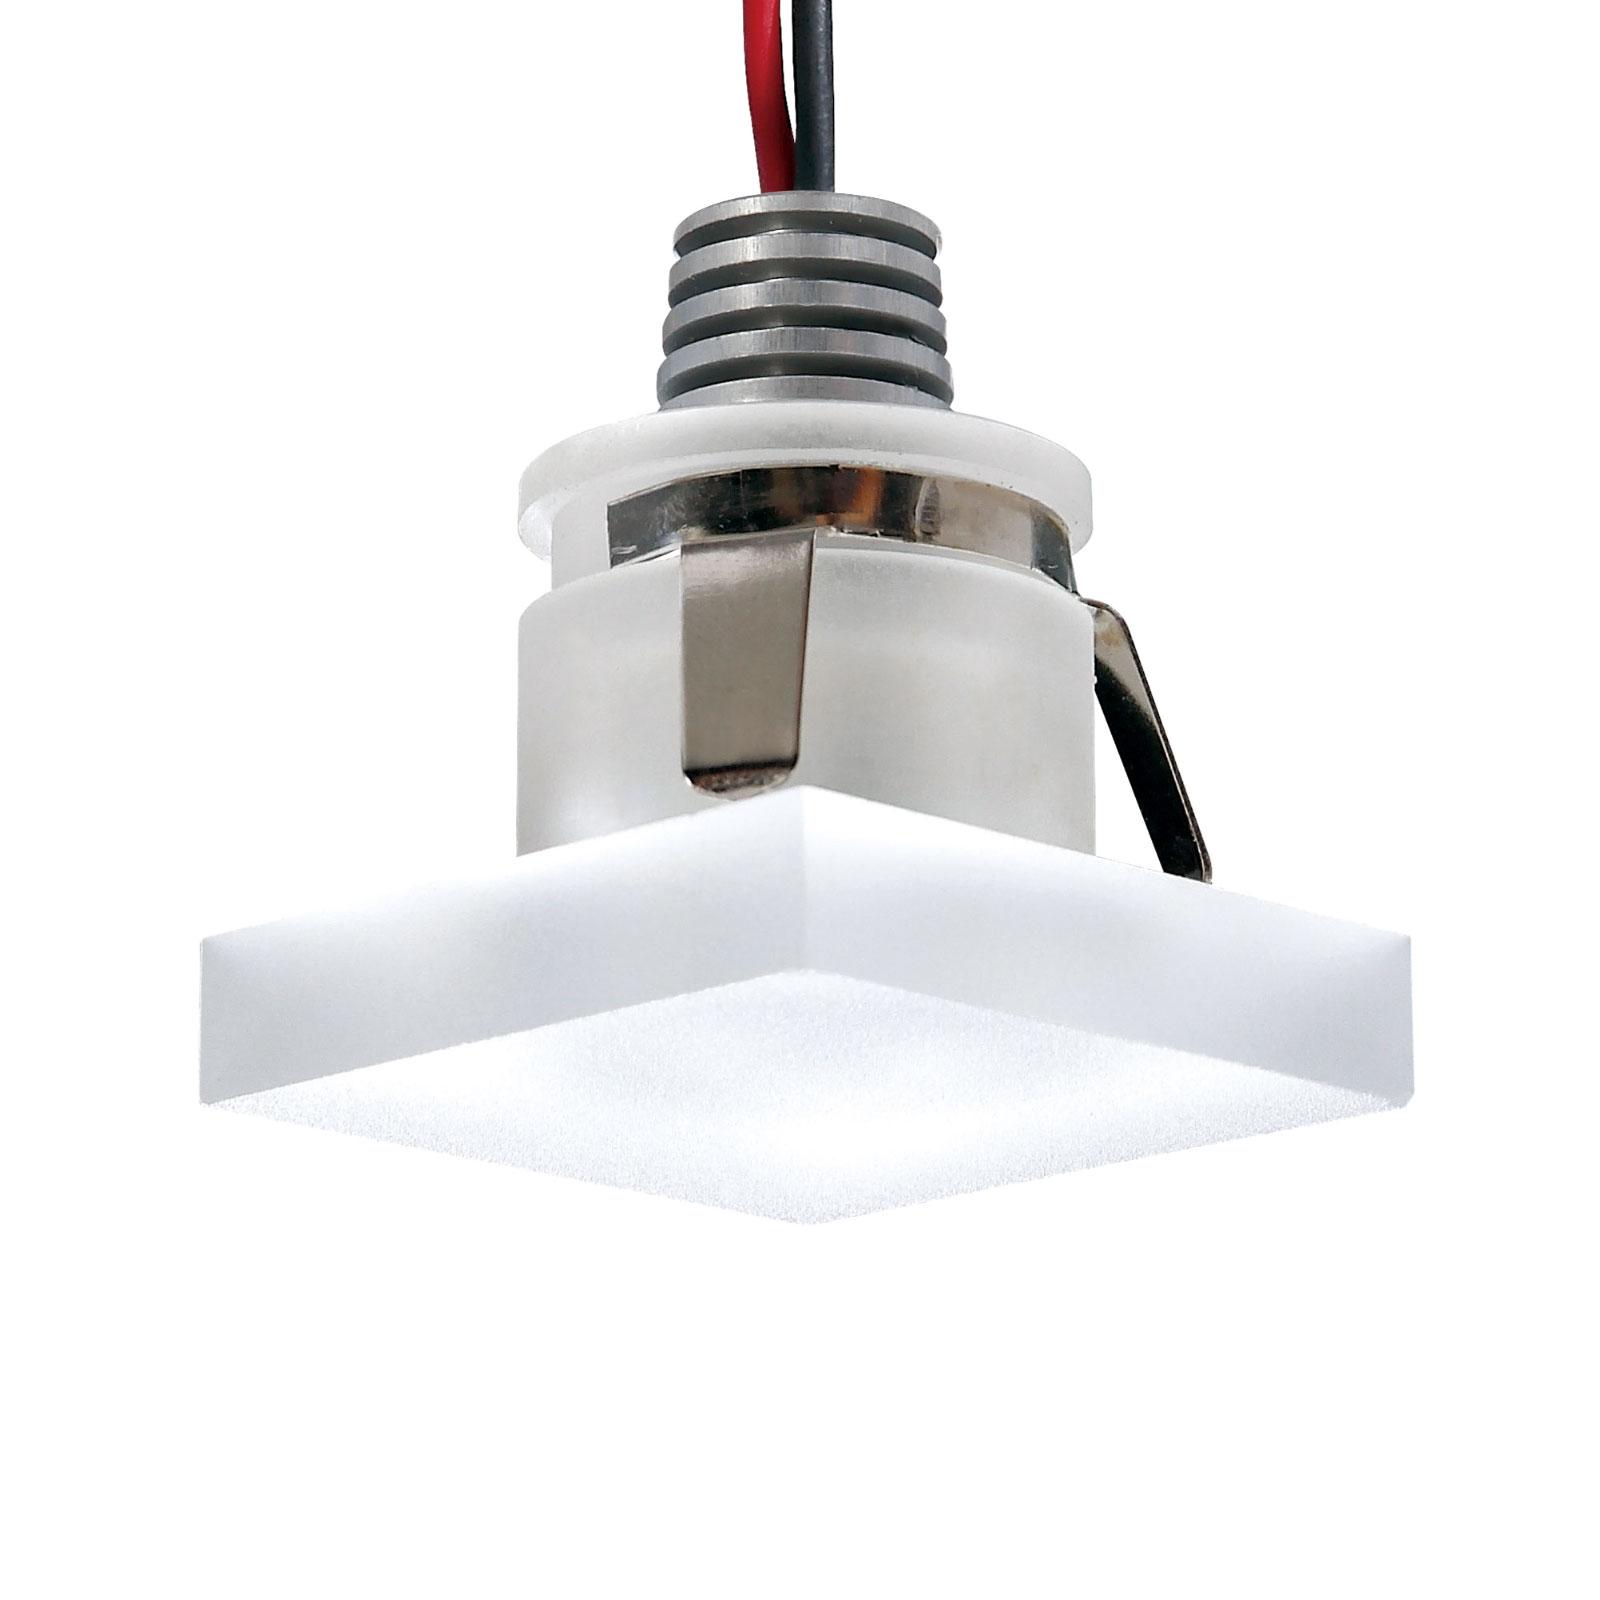 Foco empotrado LED Cristalin, angular, IP44